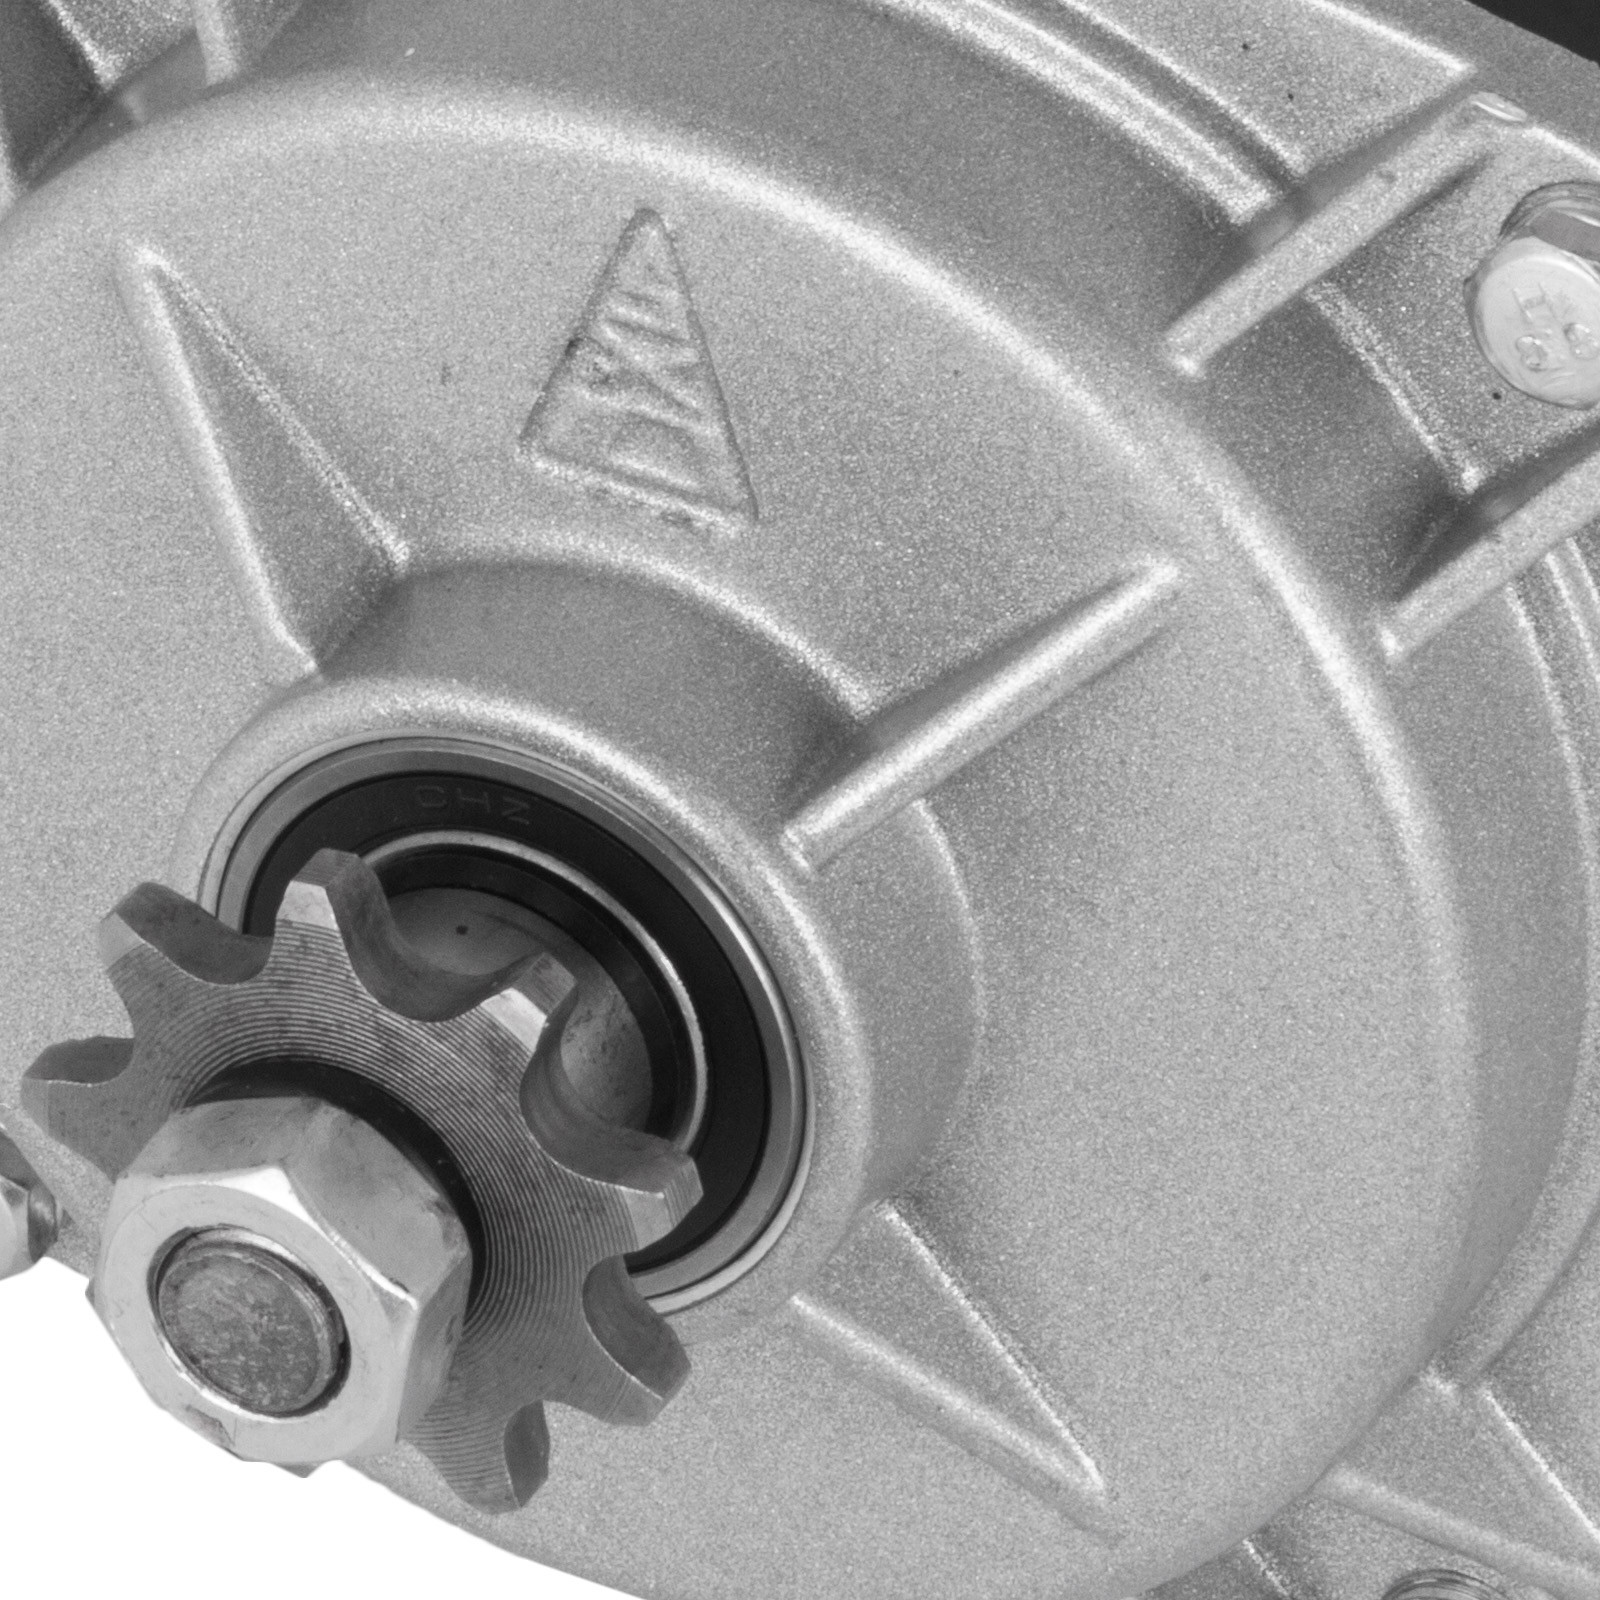 36v-Electric-Motor-controller-throttle-kit-f-Scooter-E-Scooter-ATV-Permanent thumbnail 71